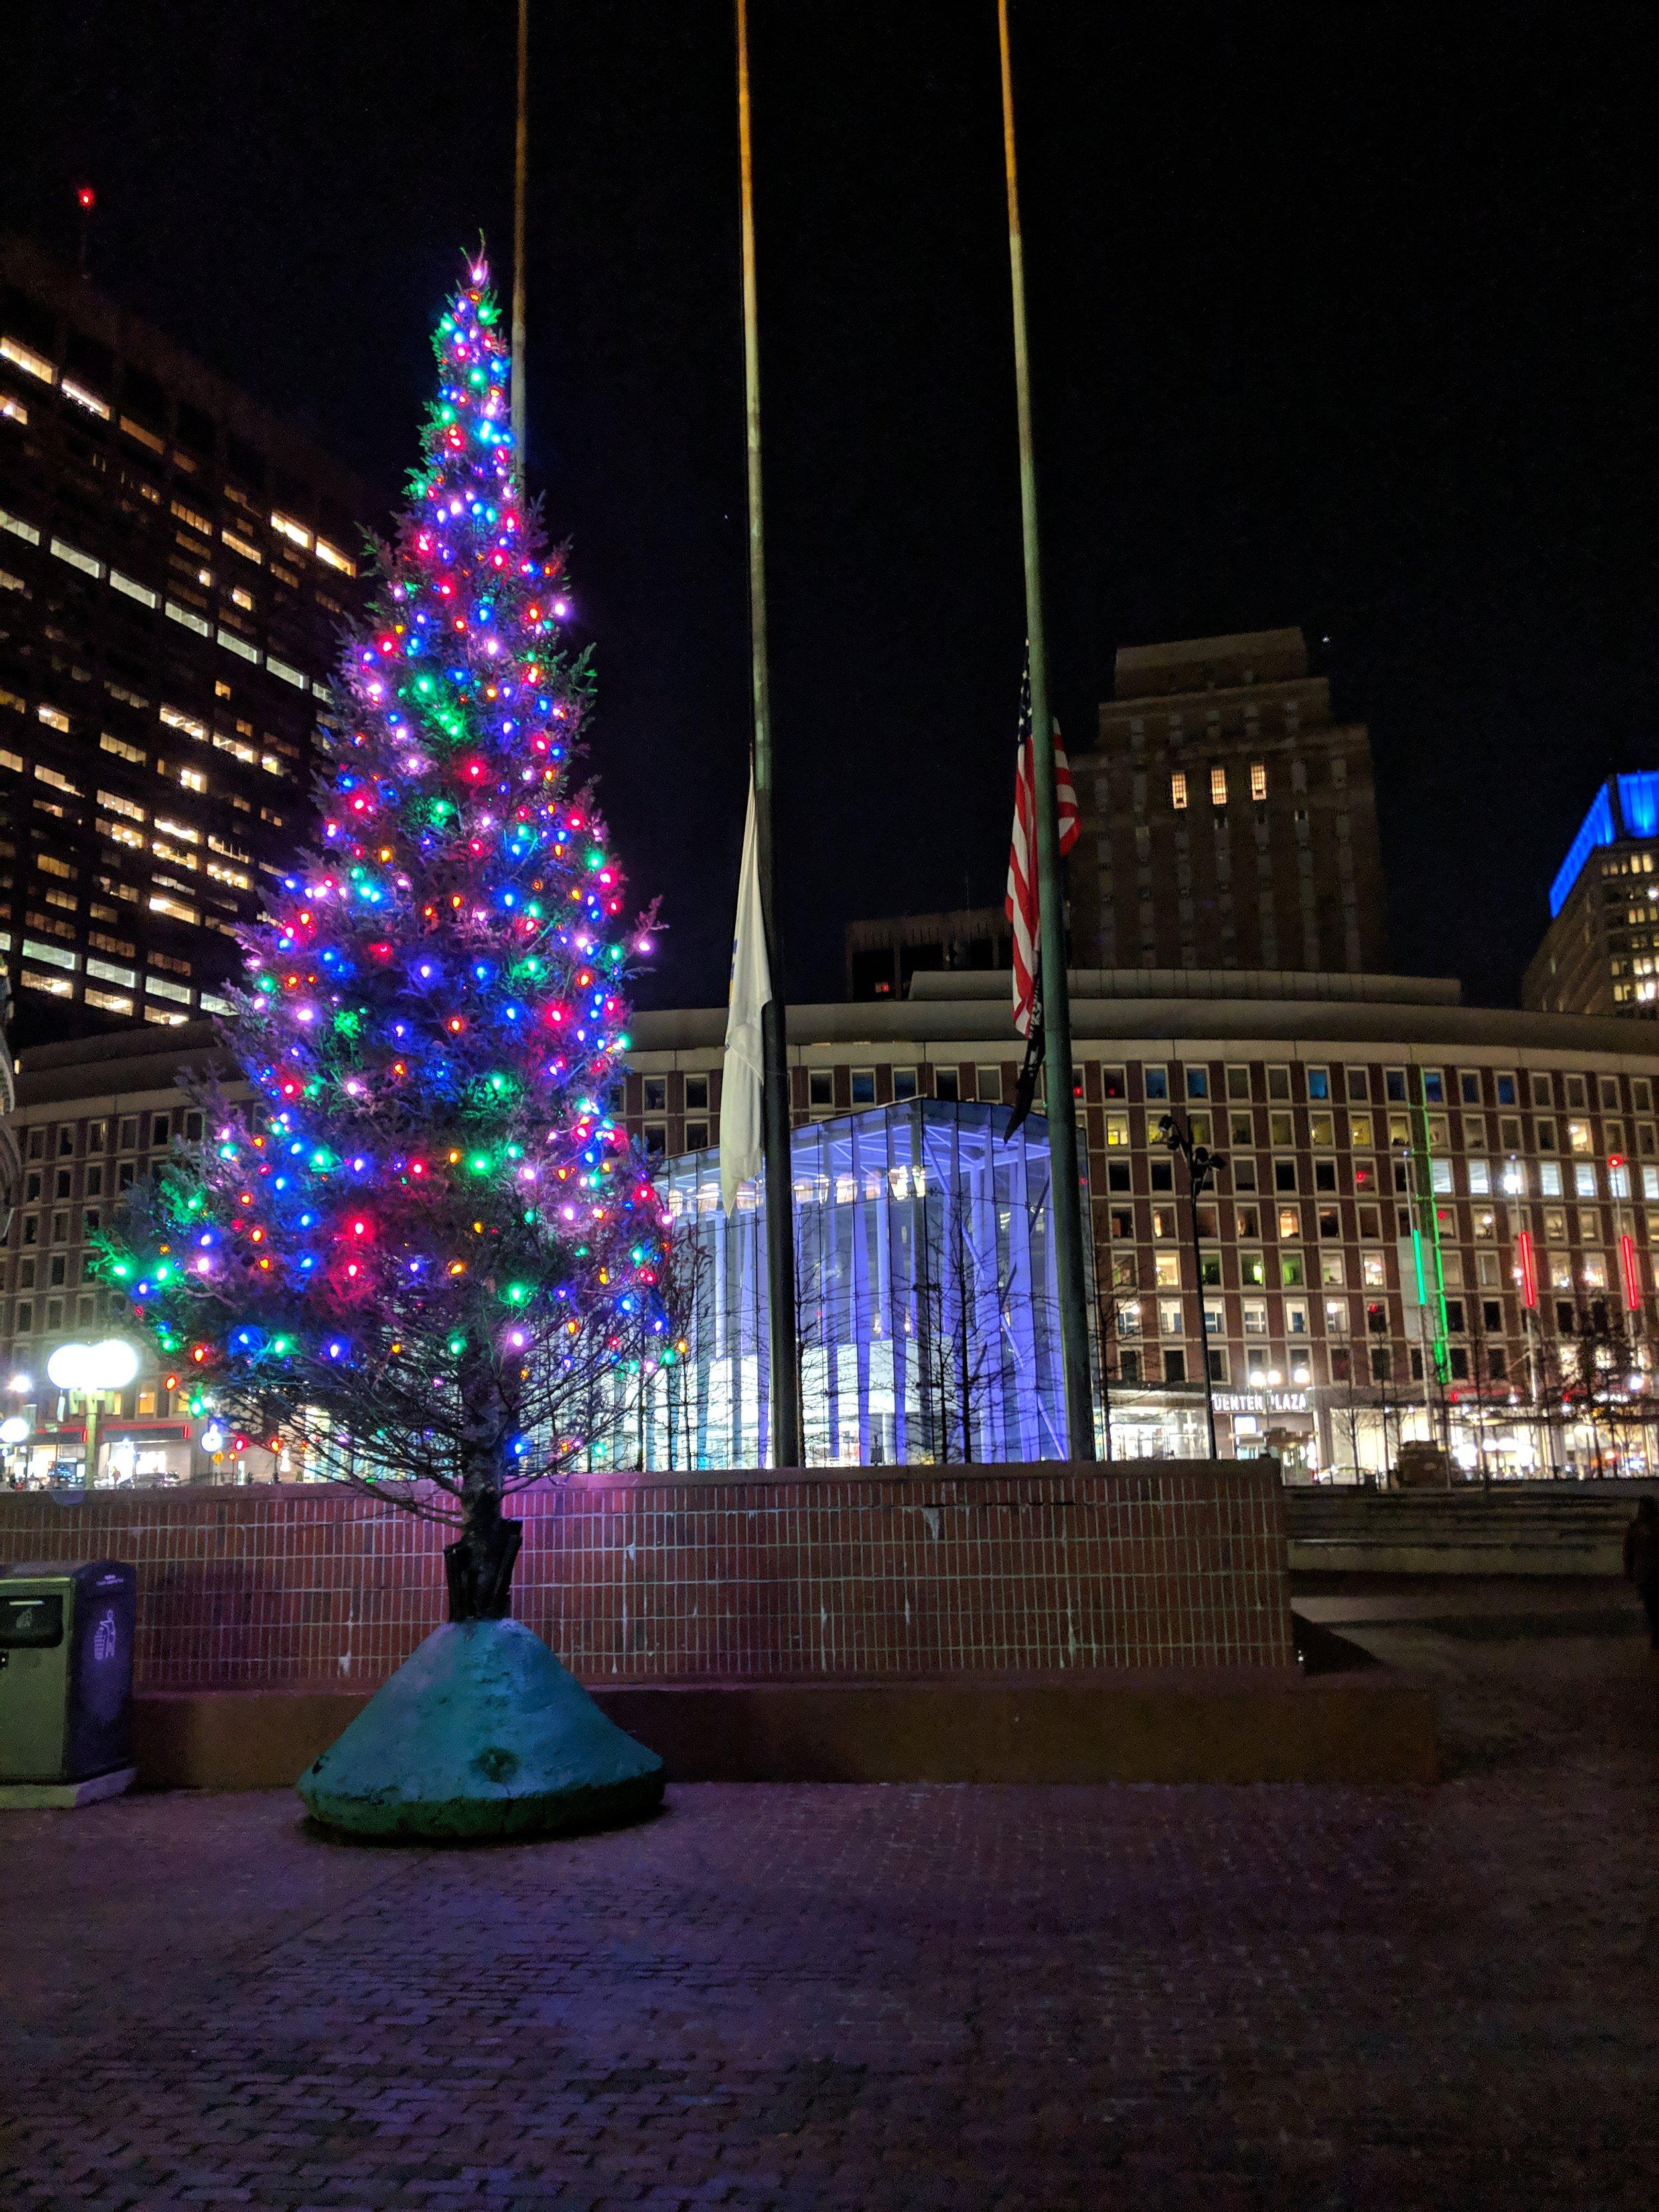 bri rinehart; photography; boston; Christmas; trees; lights